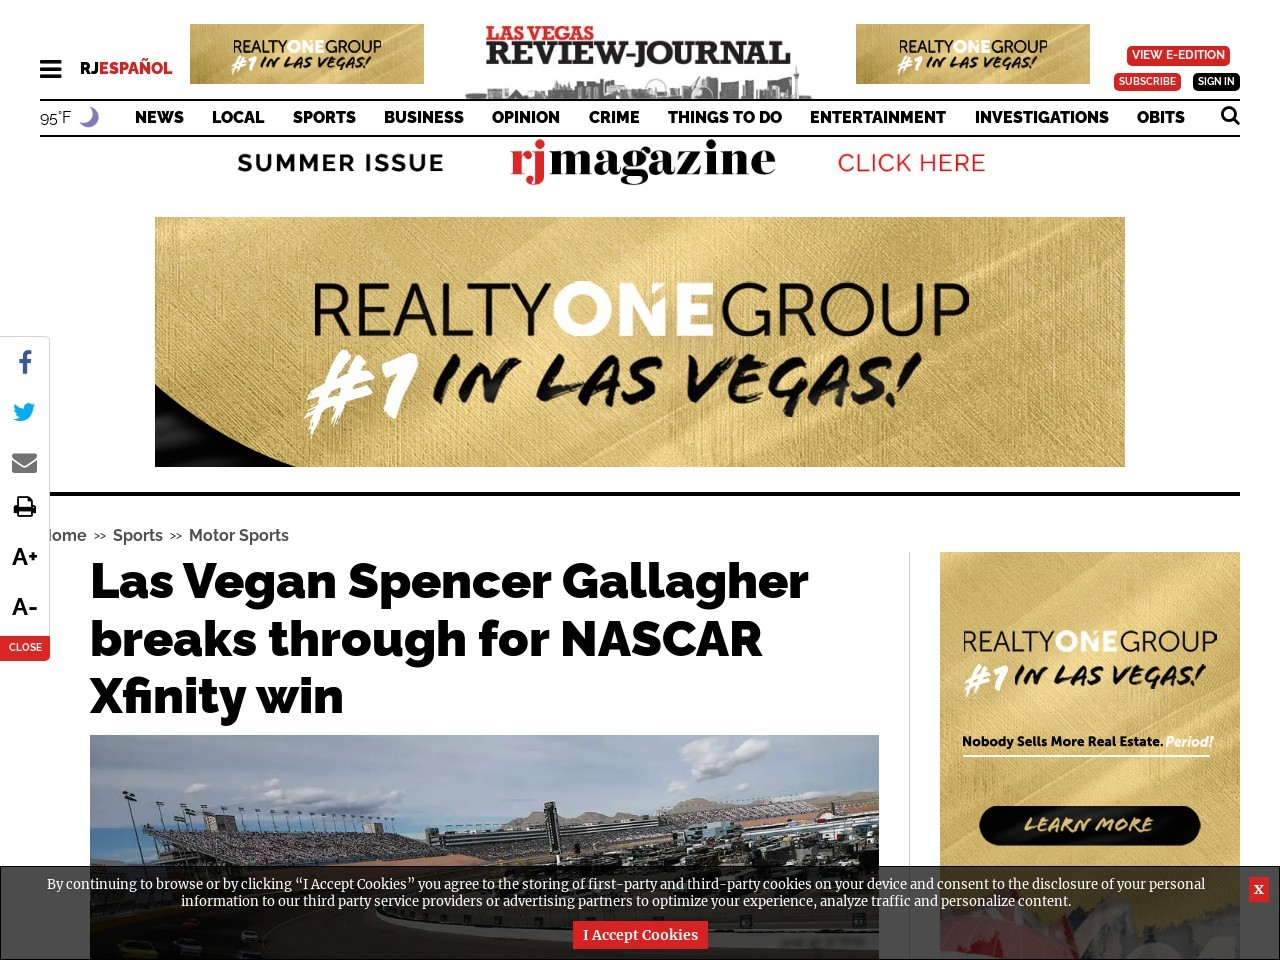 Las Vegan Spencer Gallagher breaks through for NASCAR Xfinity win